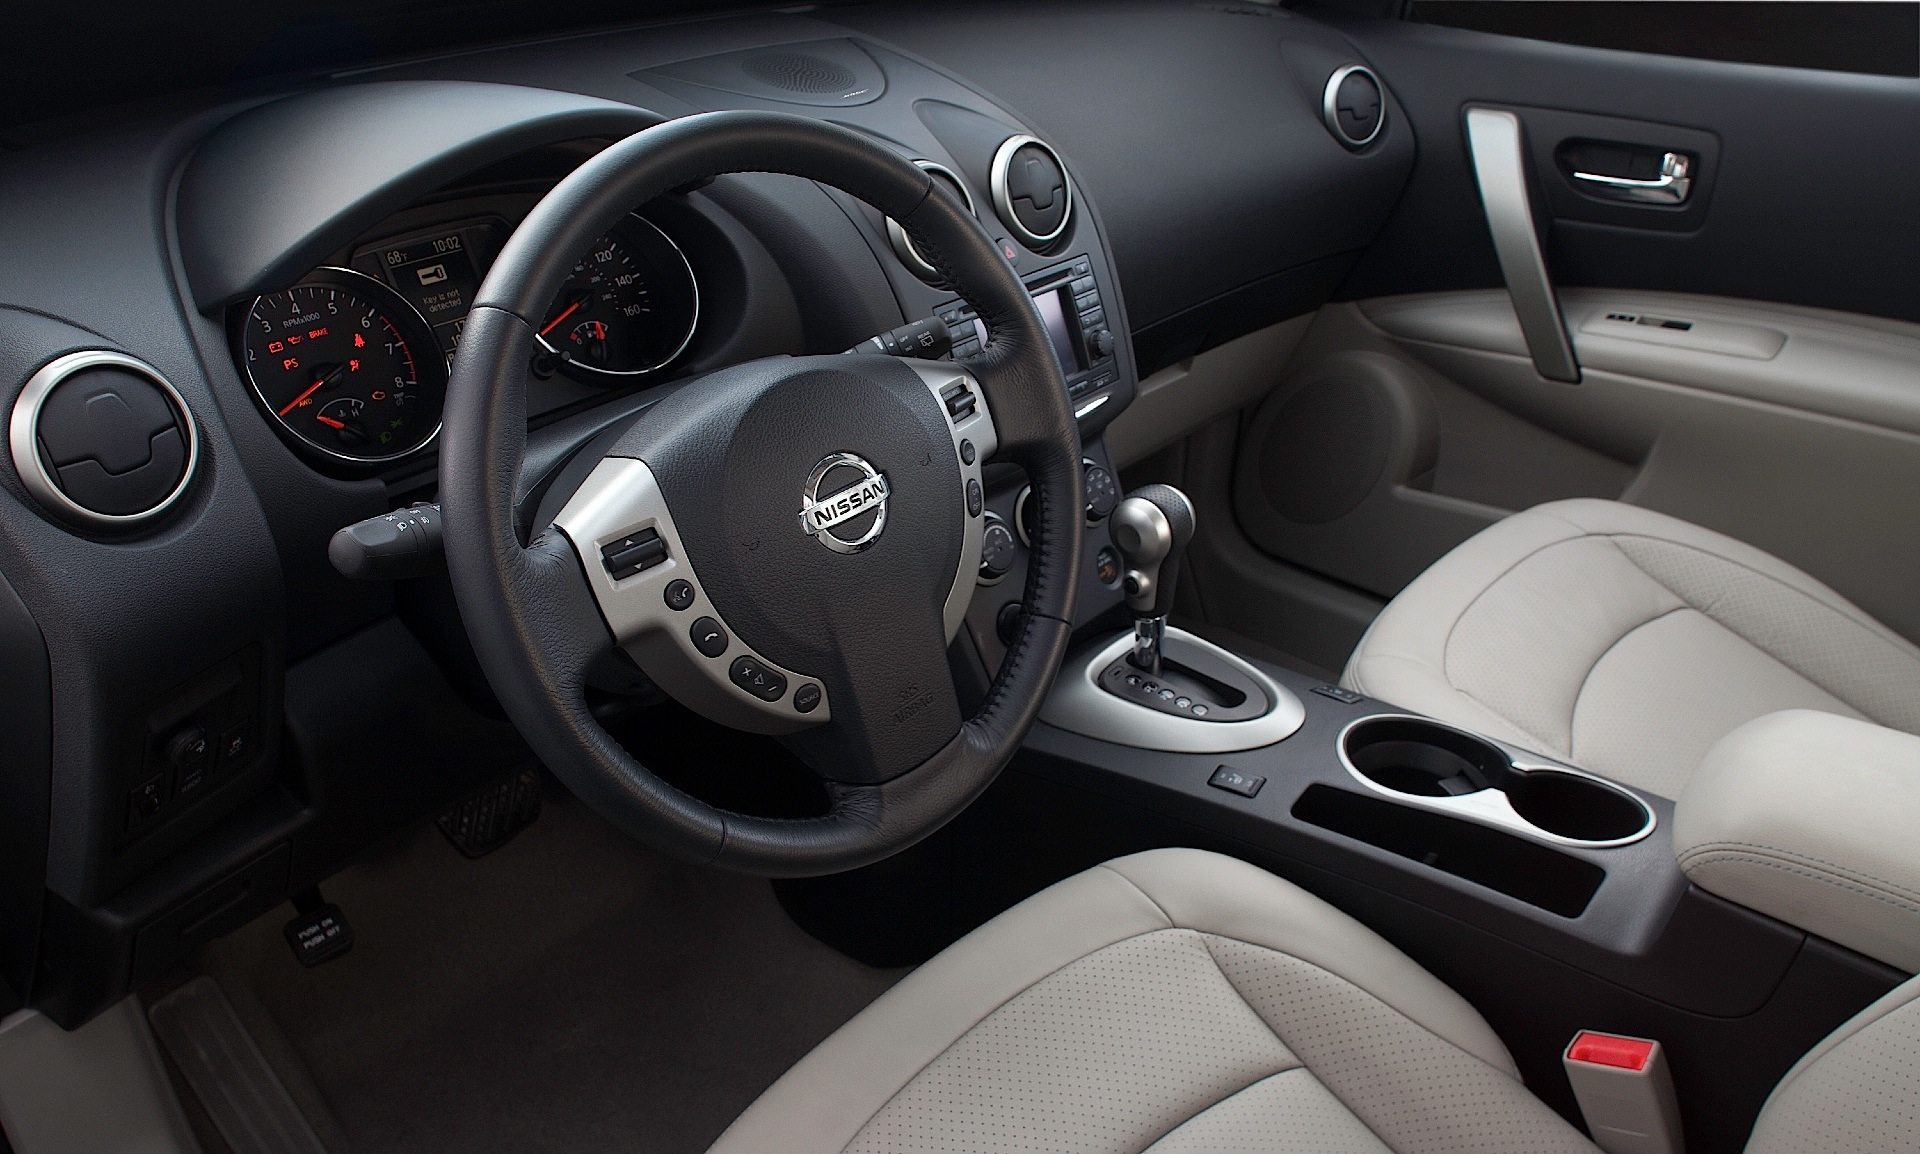 Nissan Rogue 2007 2008 2009 2010 2011 2012 2013